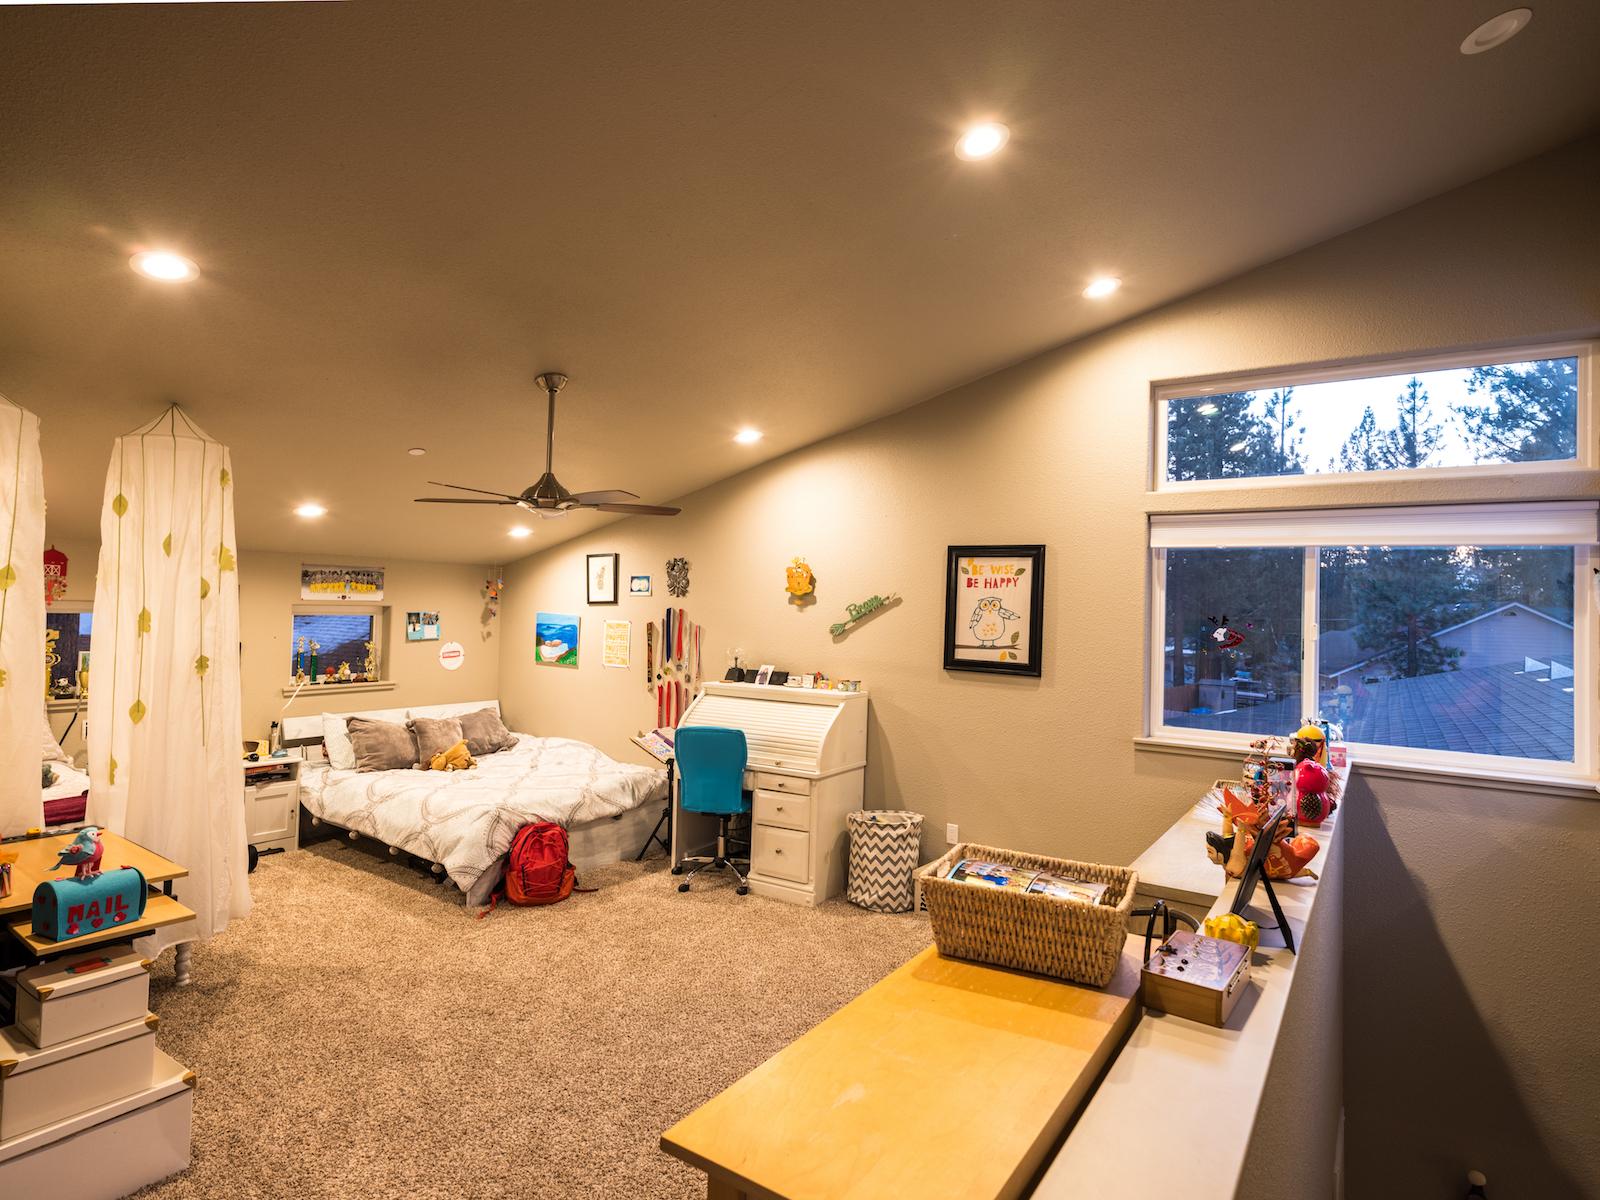 Brett_House_Interior_Ryland West (5 of 8).jpg